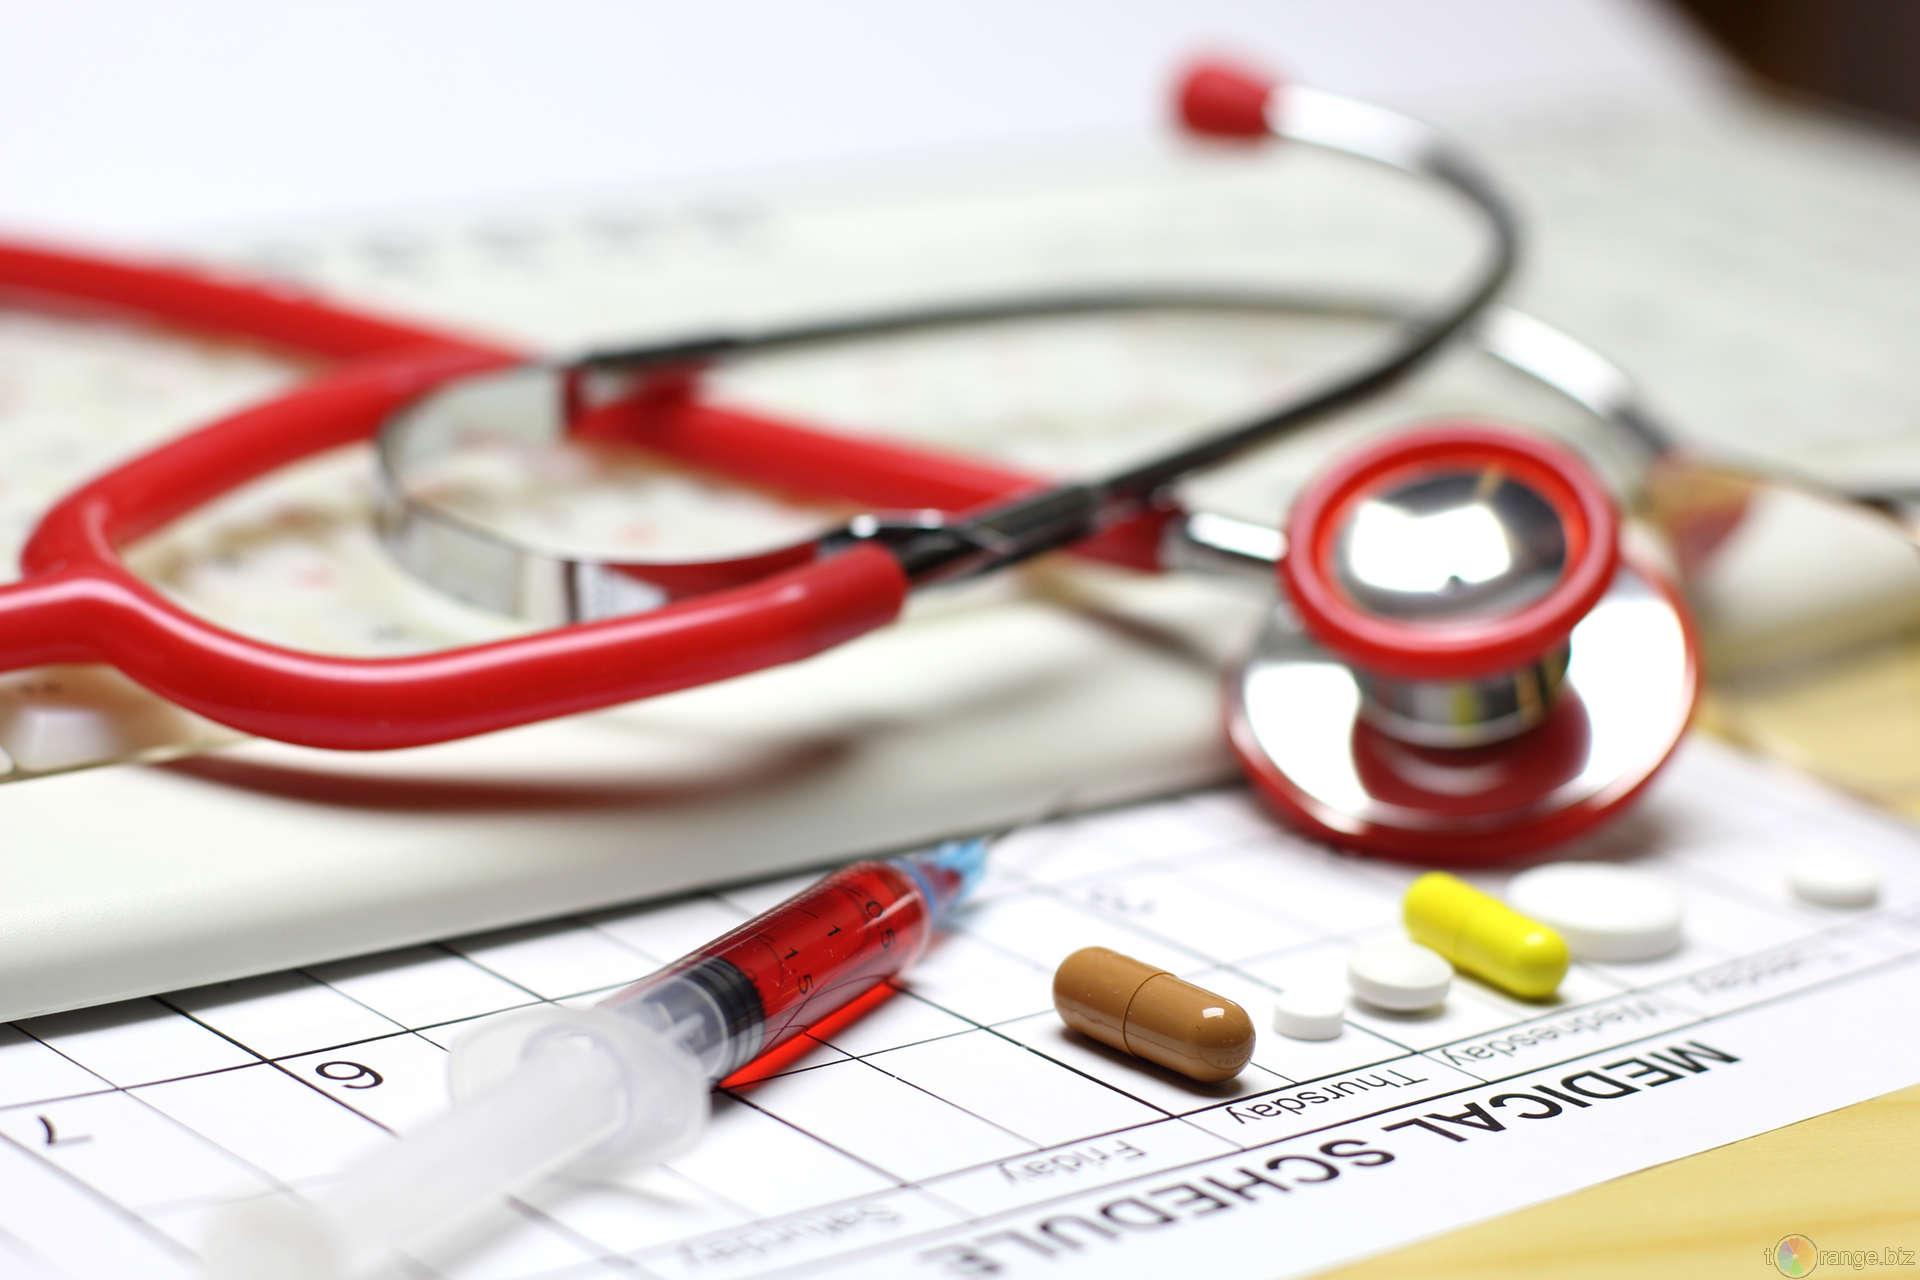 Зареєстровано законопроект про загальнообов'язкове державне соціальне медичне страхування